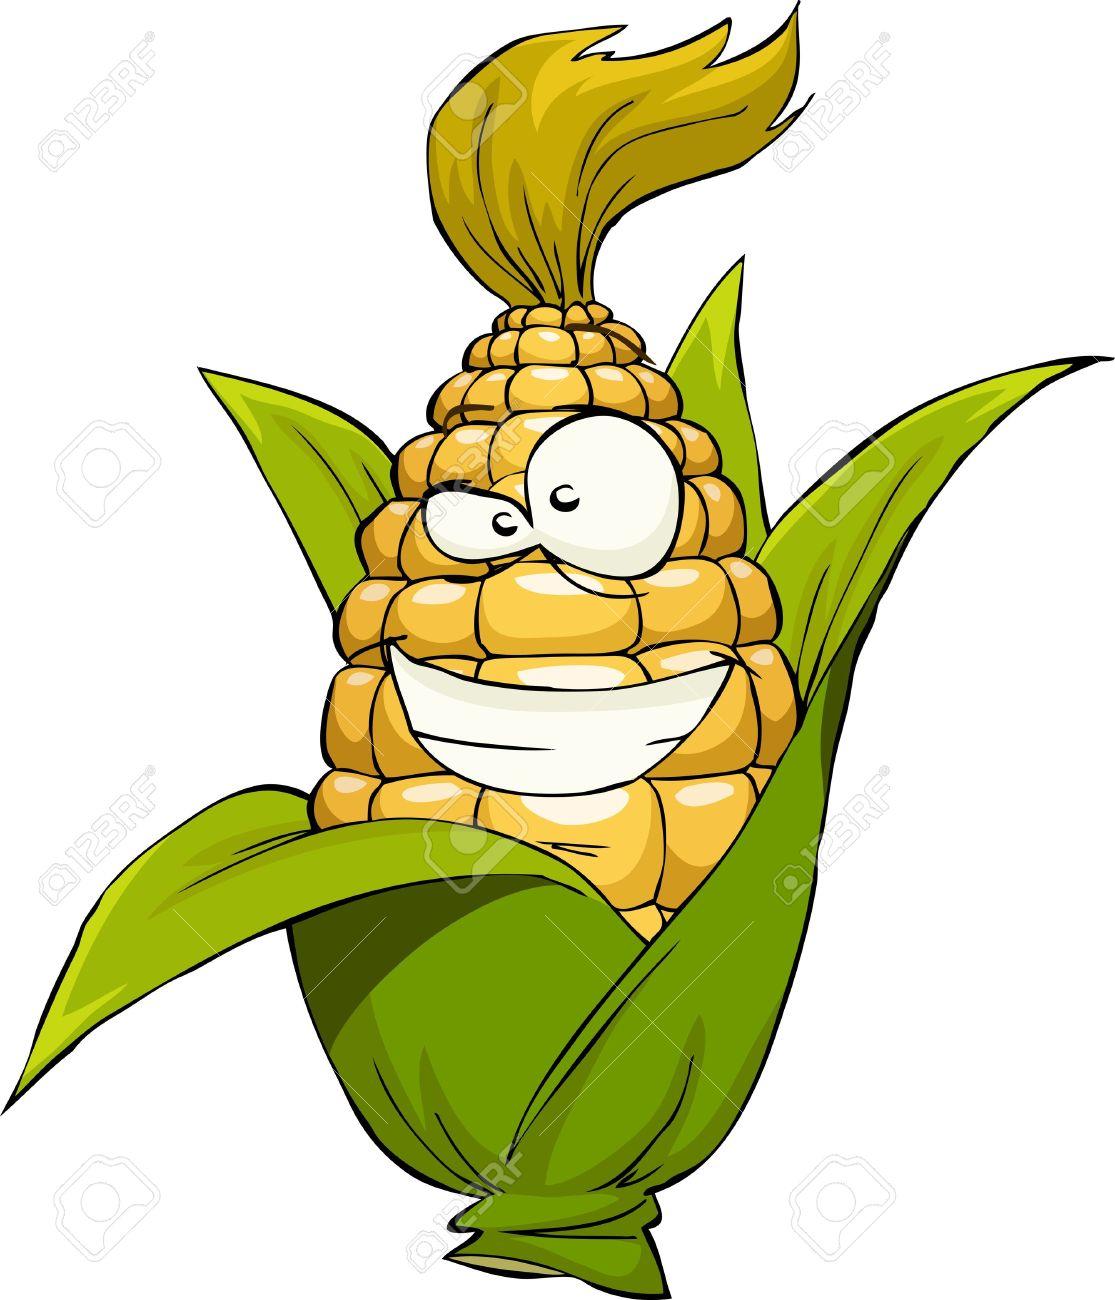 12356607-Corn-on-a-white-background-vector-illustration-Stock-Vector-corn-cob-cartoon